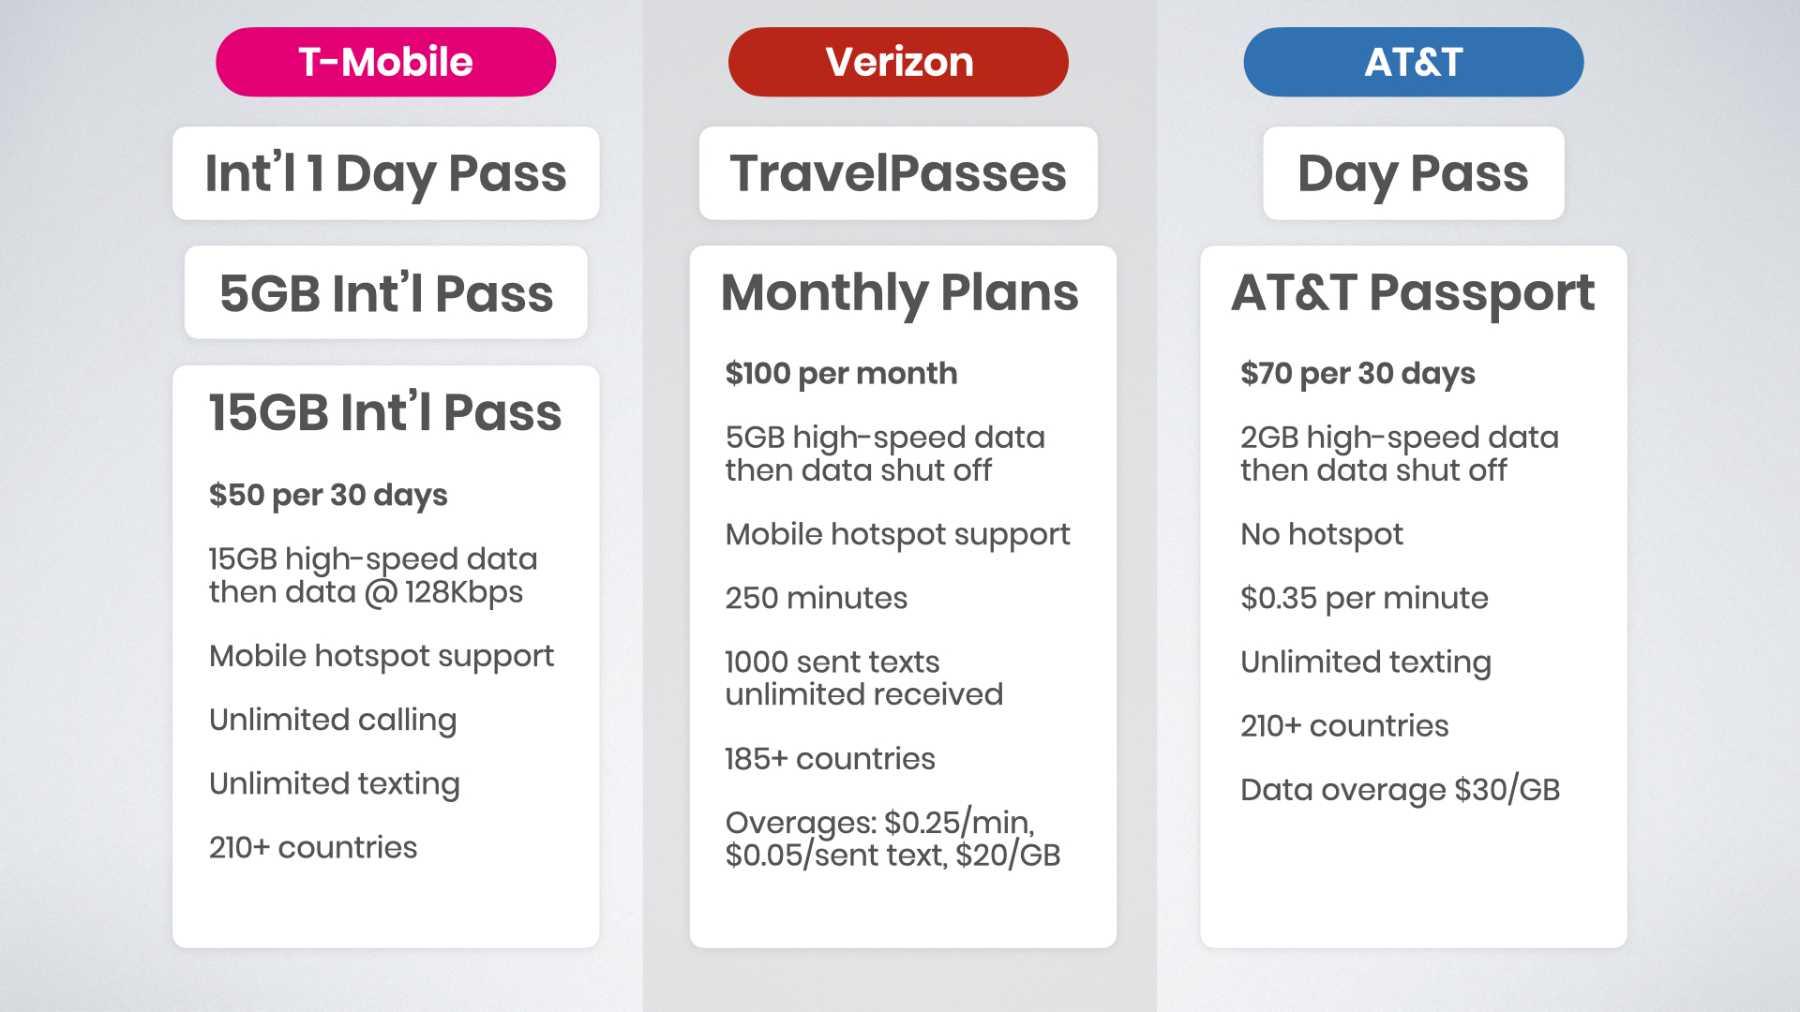 T-Mobile 15GB international pass